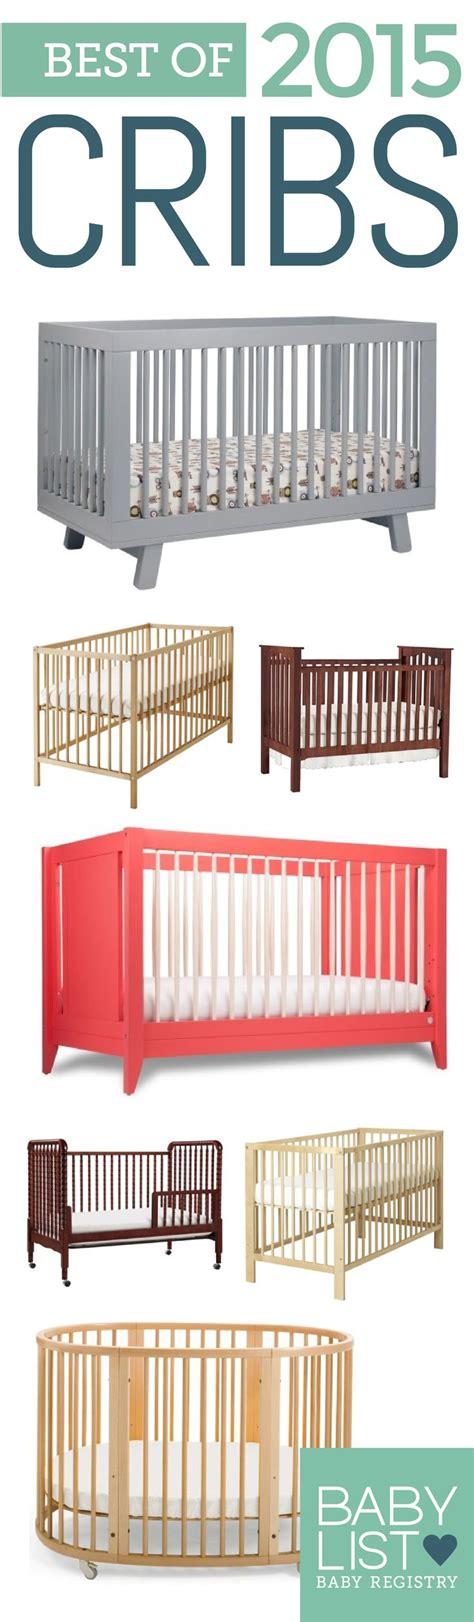 Mdb Family Cribs by Need Some Crib Advice To Help The Playroom By Mdb